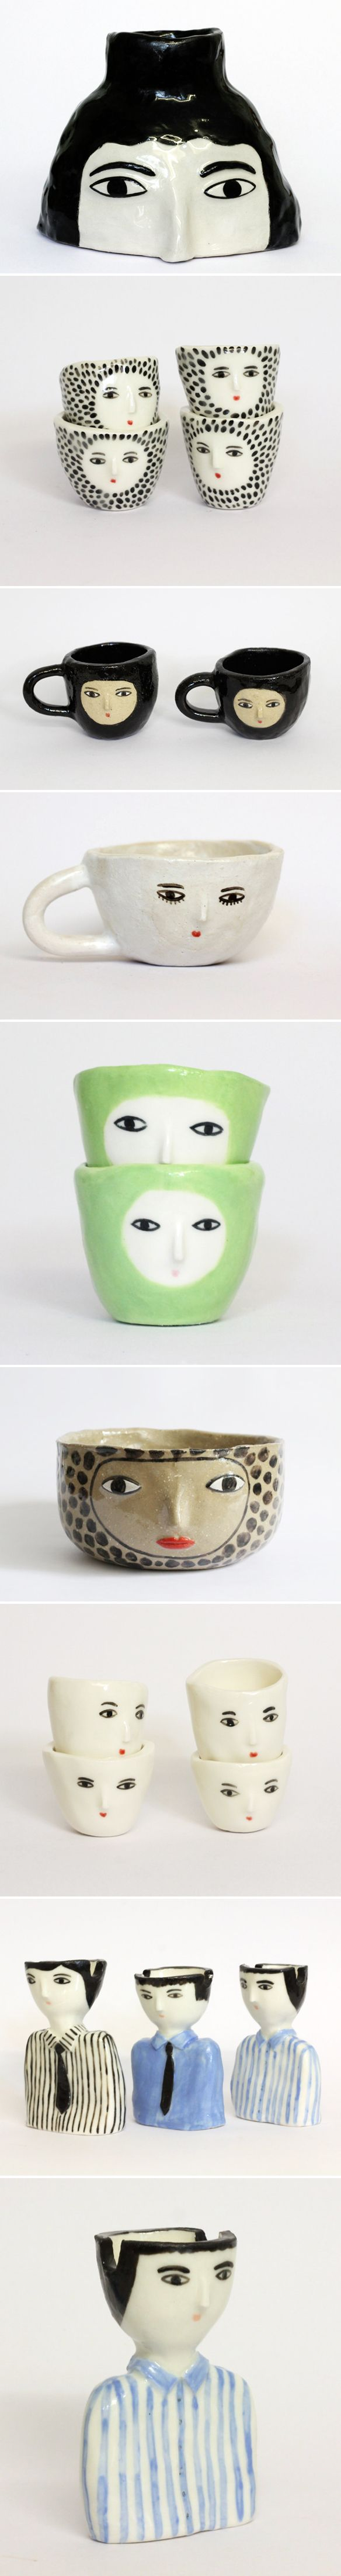 Mugs and ashtrays(!!) by kinska